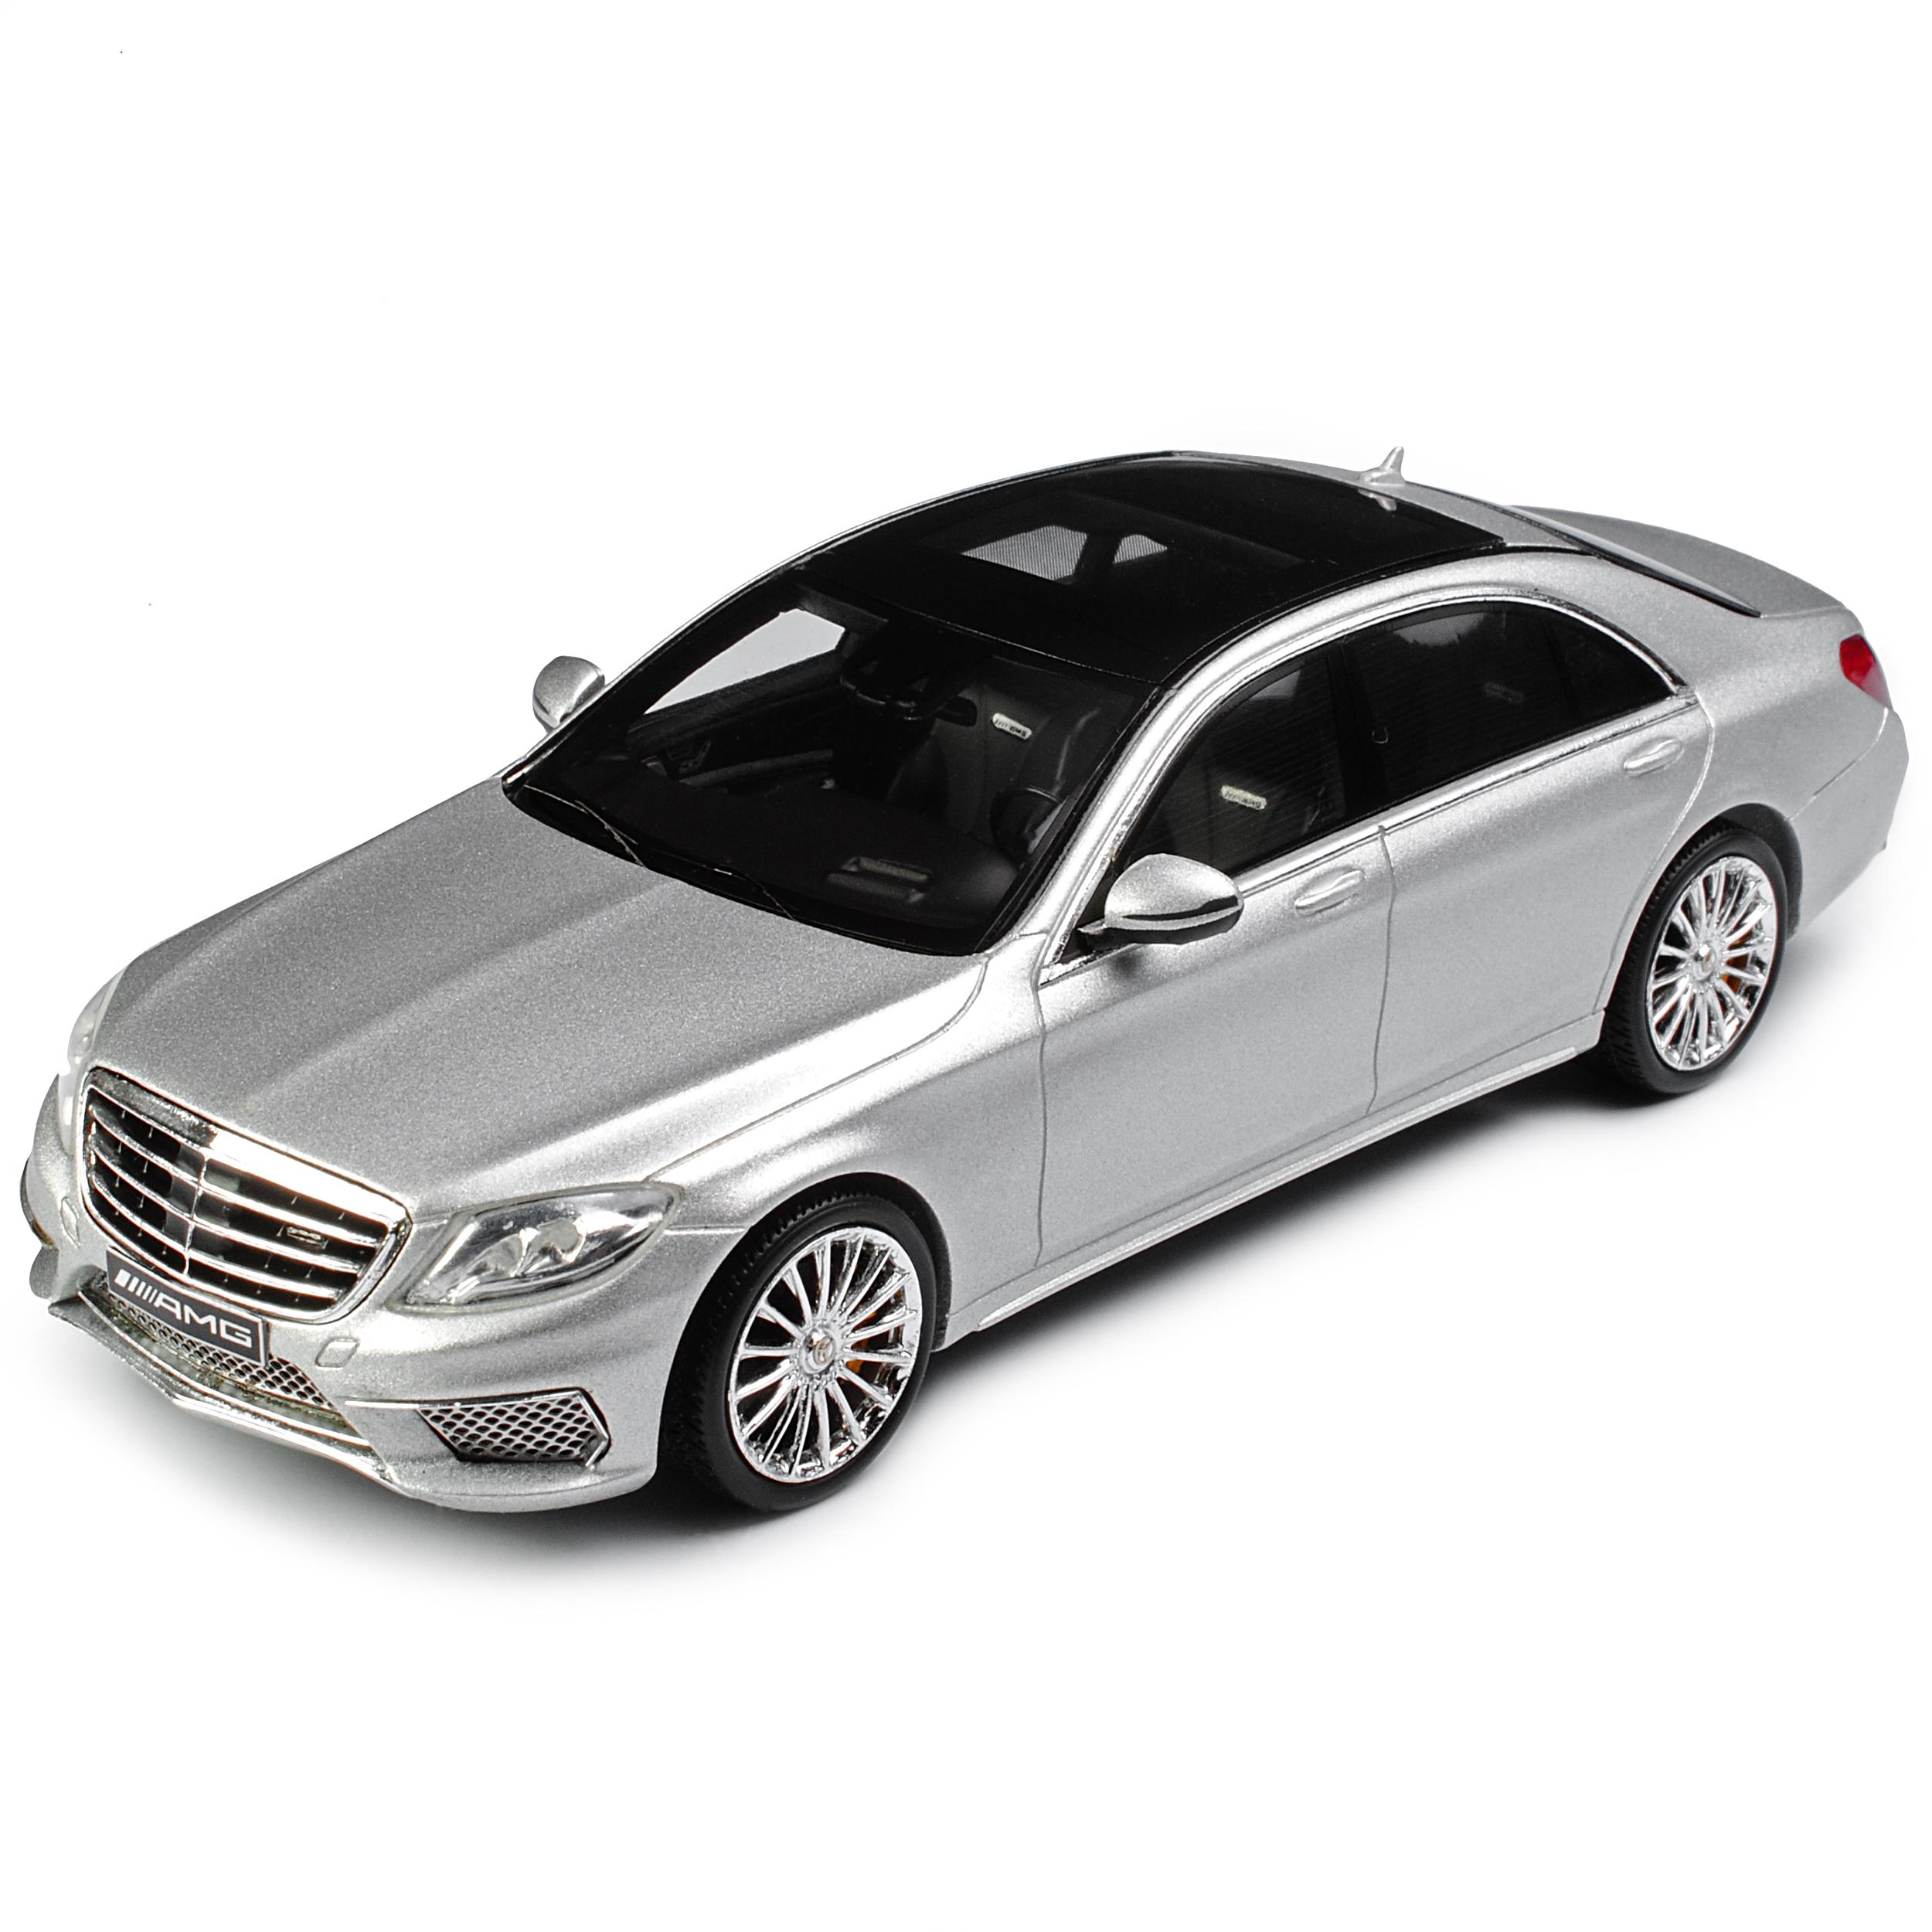 MERCEDES-BENZ CLASSE S s65 AMG dal v222 Limousine Iridio argentoo Magno a partire dal AMG 2013 1 4... f41532